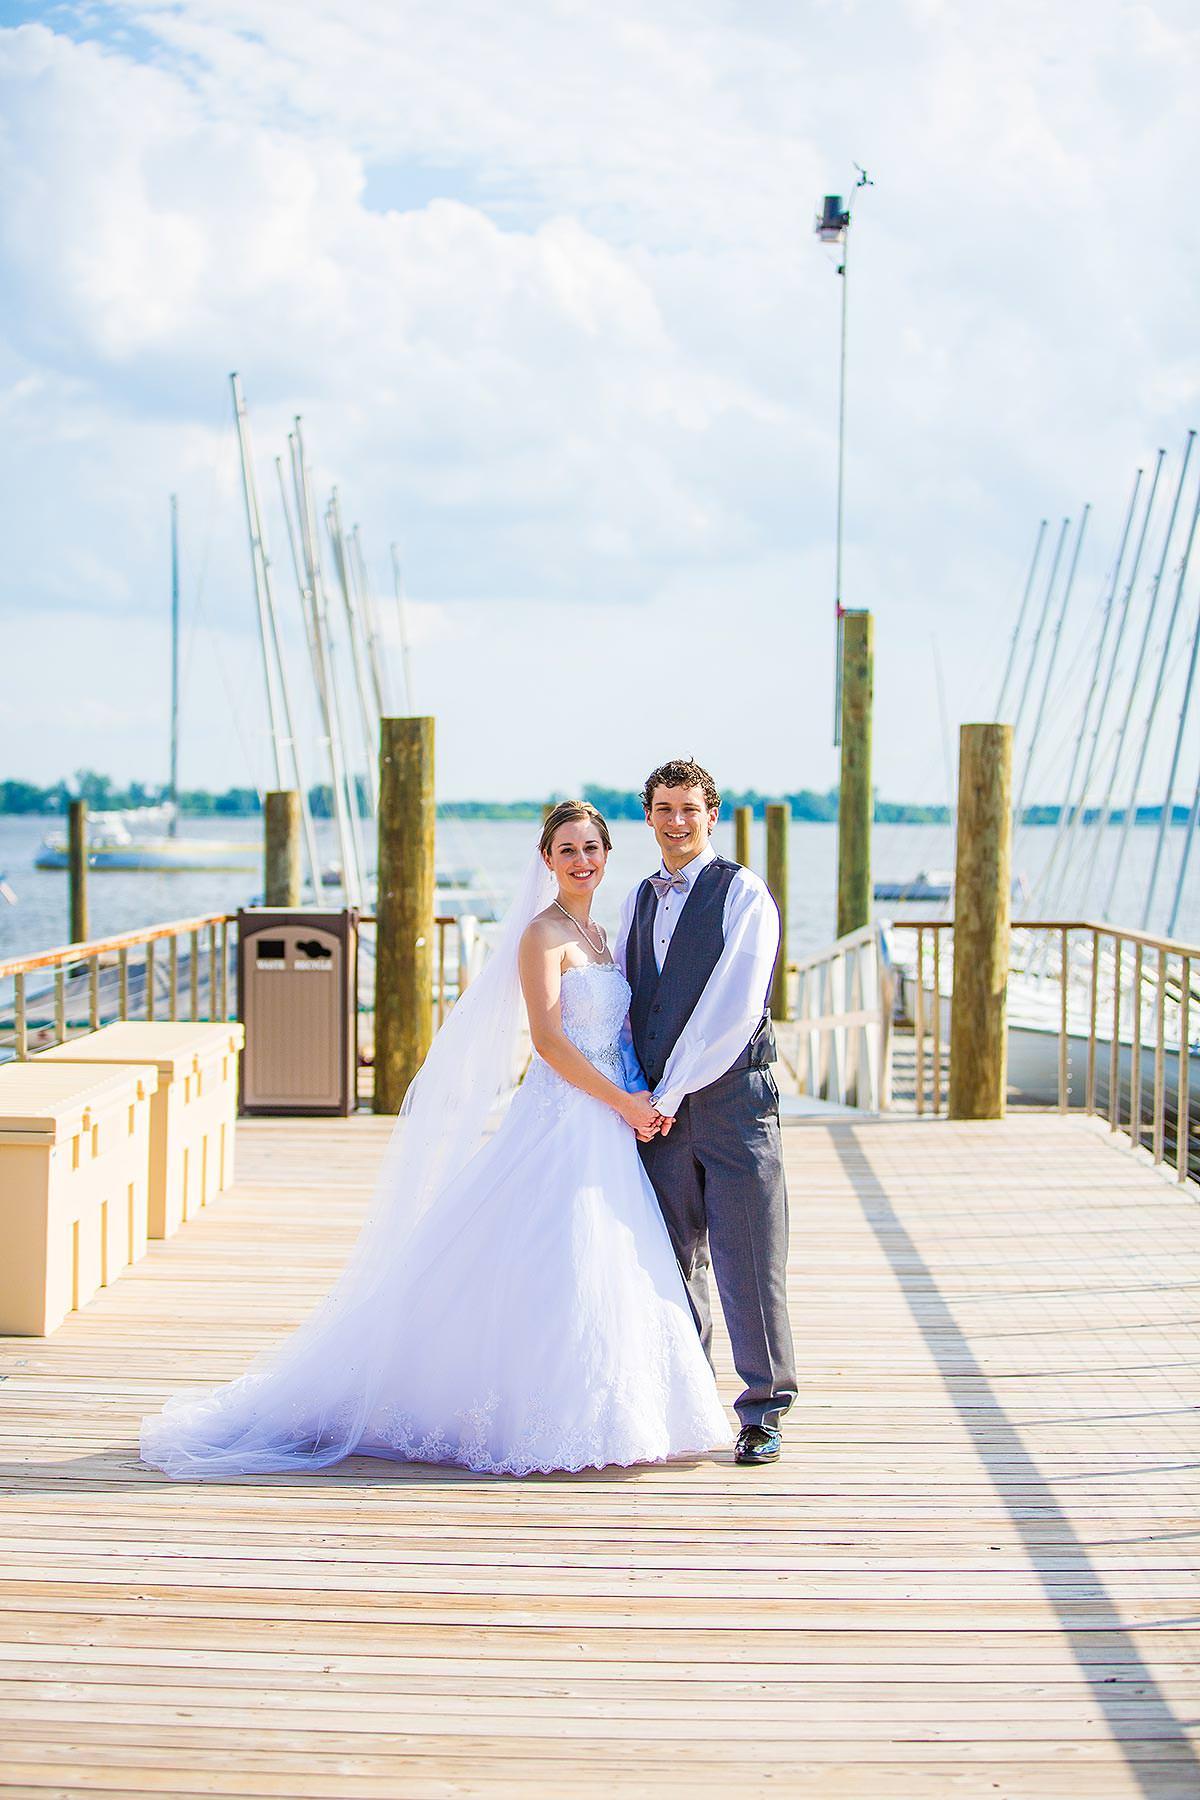 Corinthian Yacht Club Philadelphia Wedding Cost Info